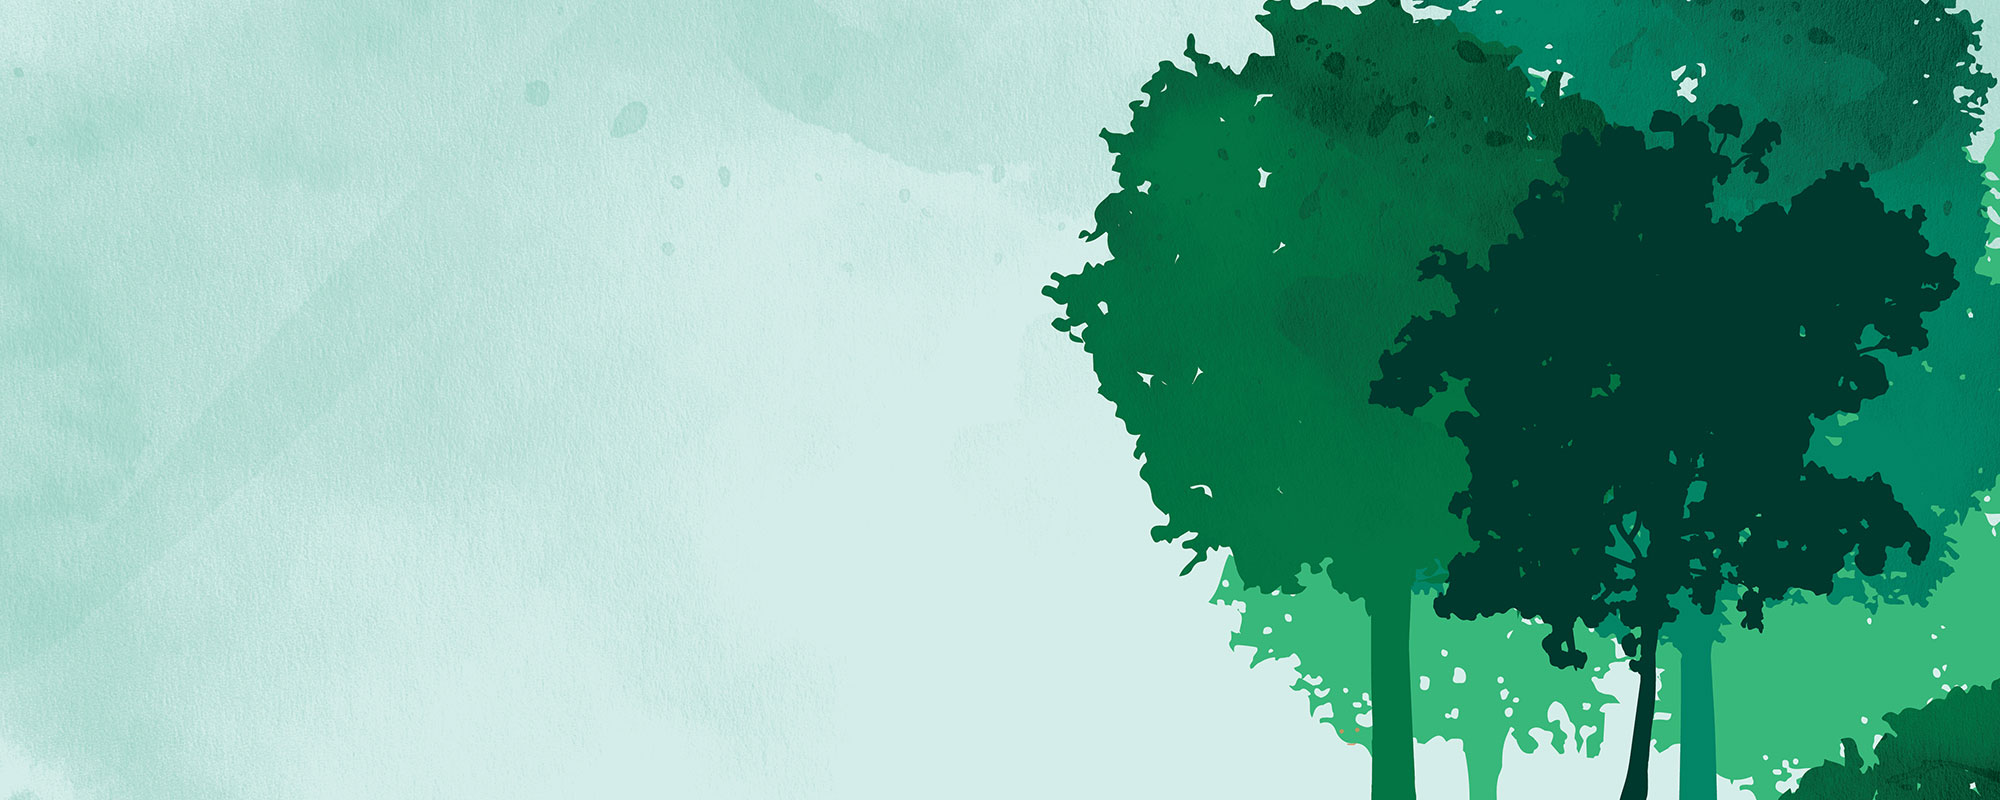 Puut, kuvituskuva.